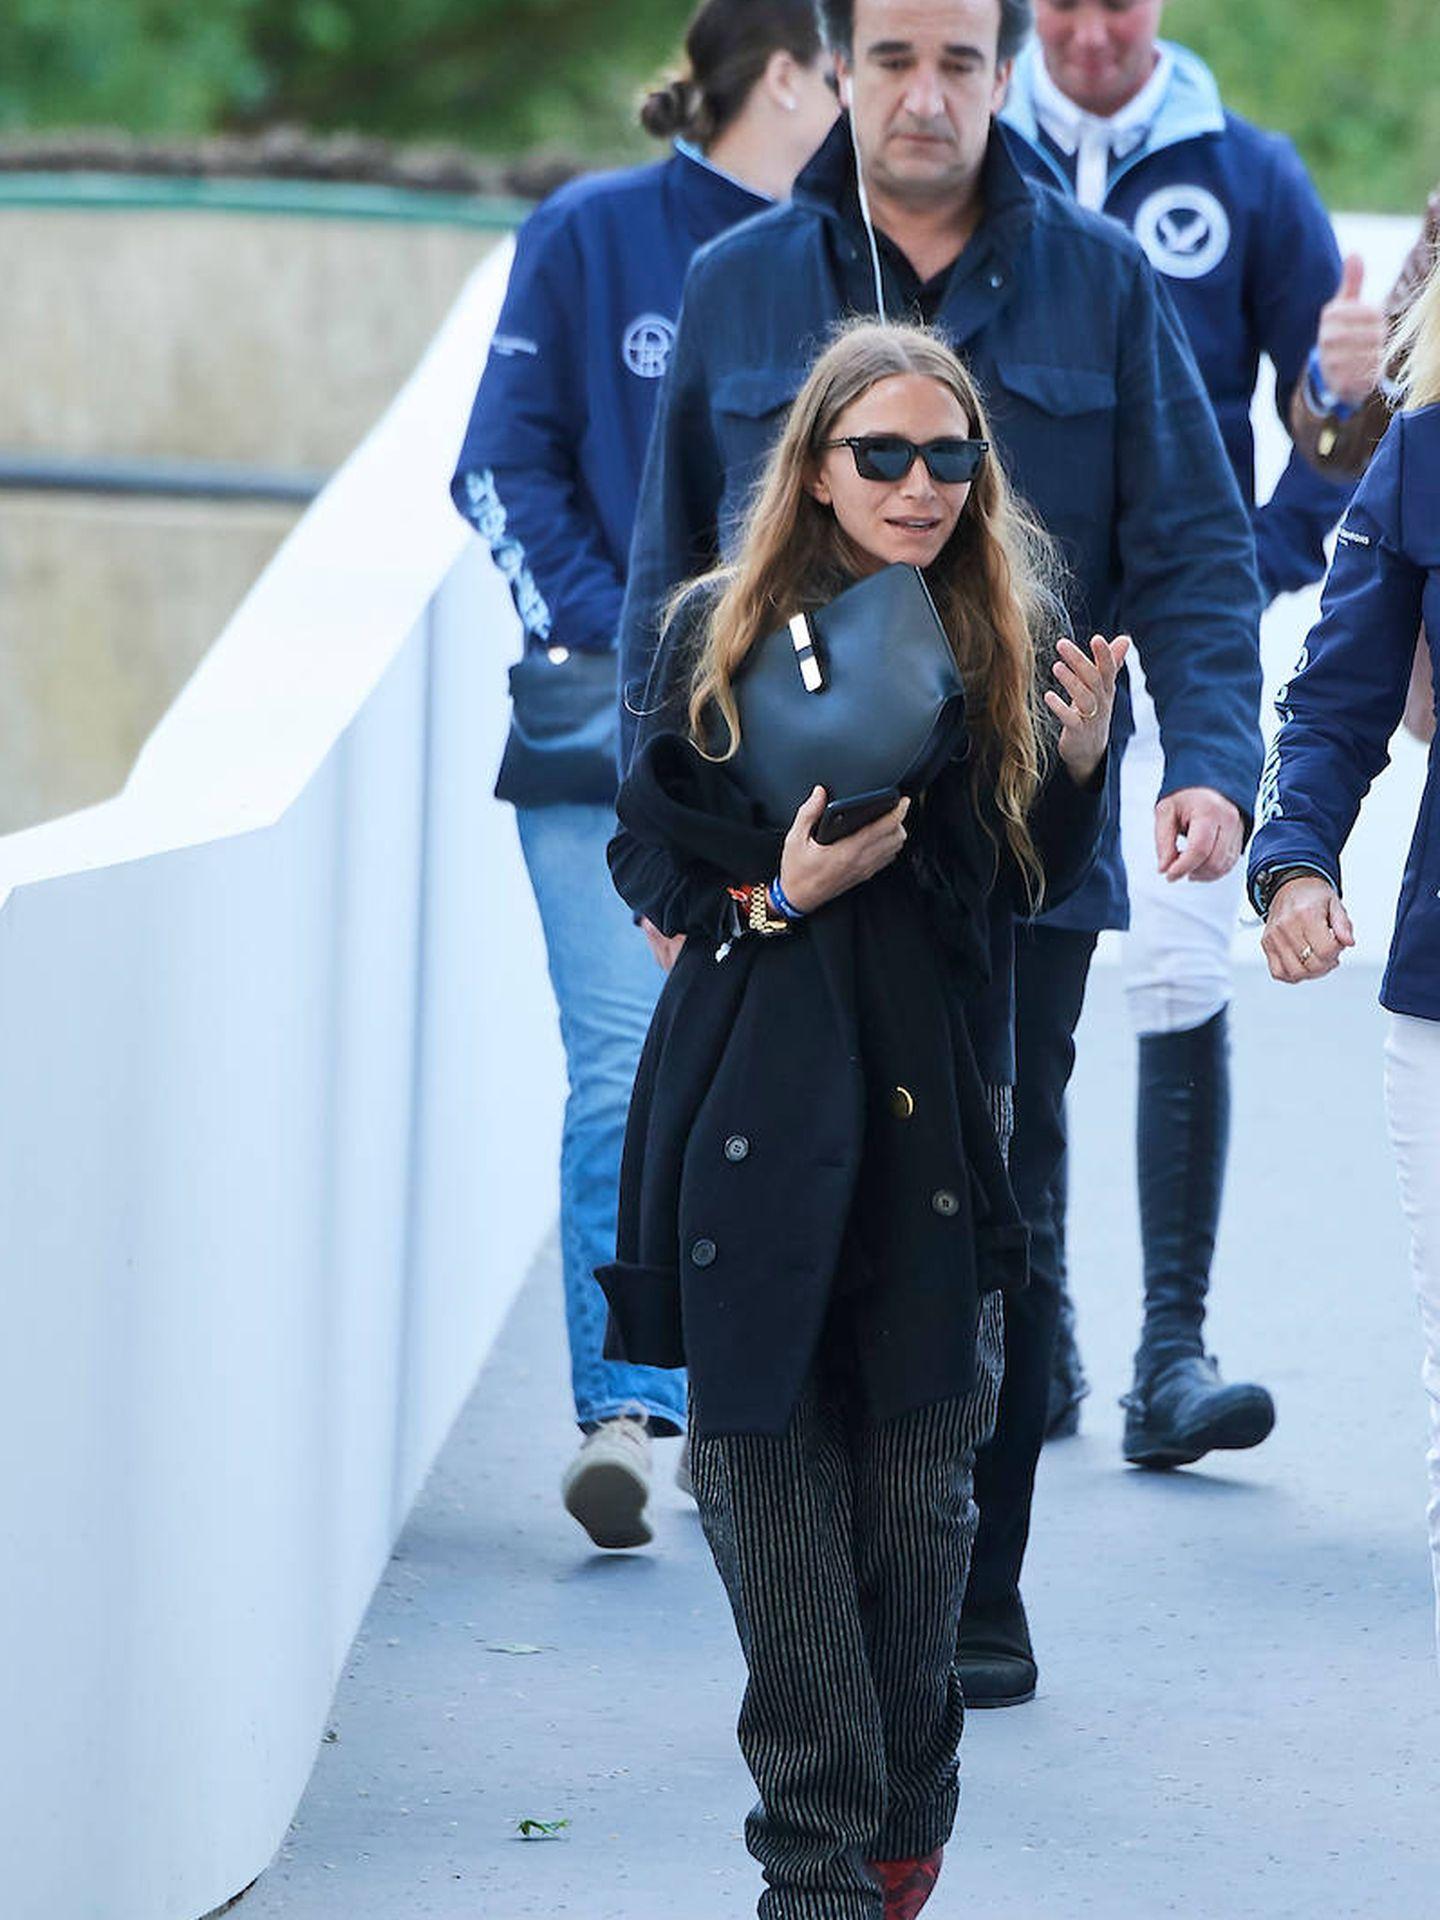 Mary-Kate Olsen y Olivier Sarkozy en el Longines Global Champions Tour 2019 de Madrid. (Limites Pictures)